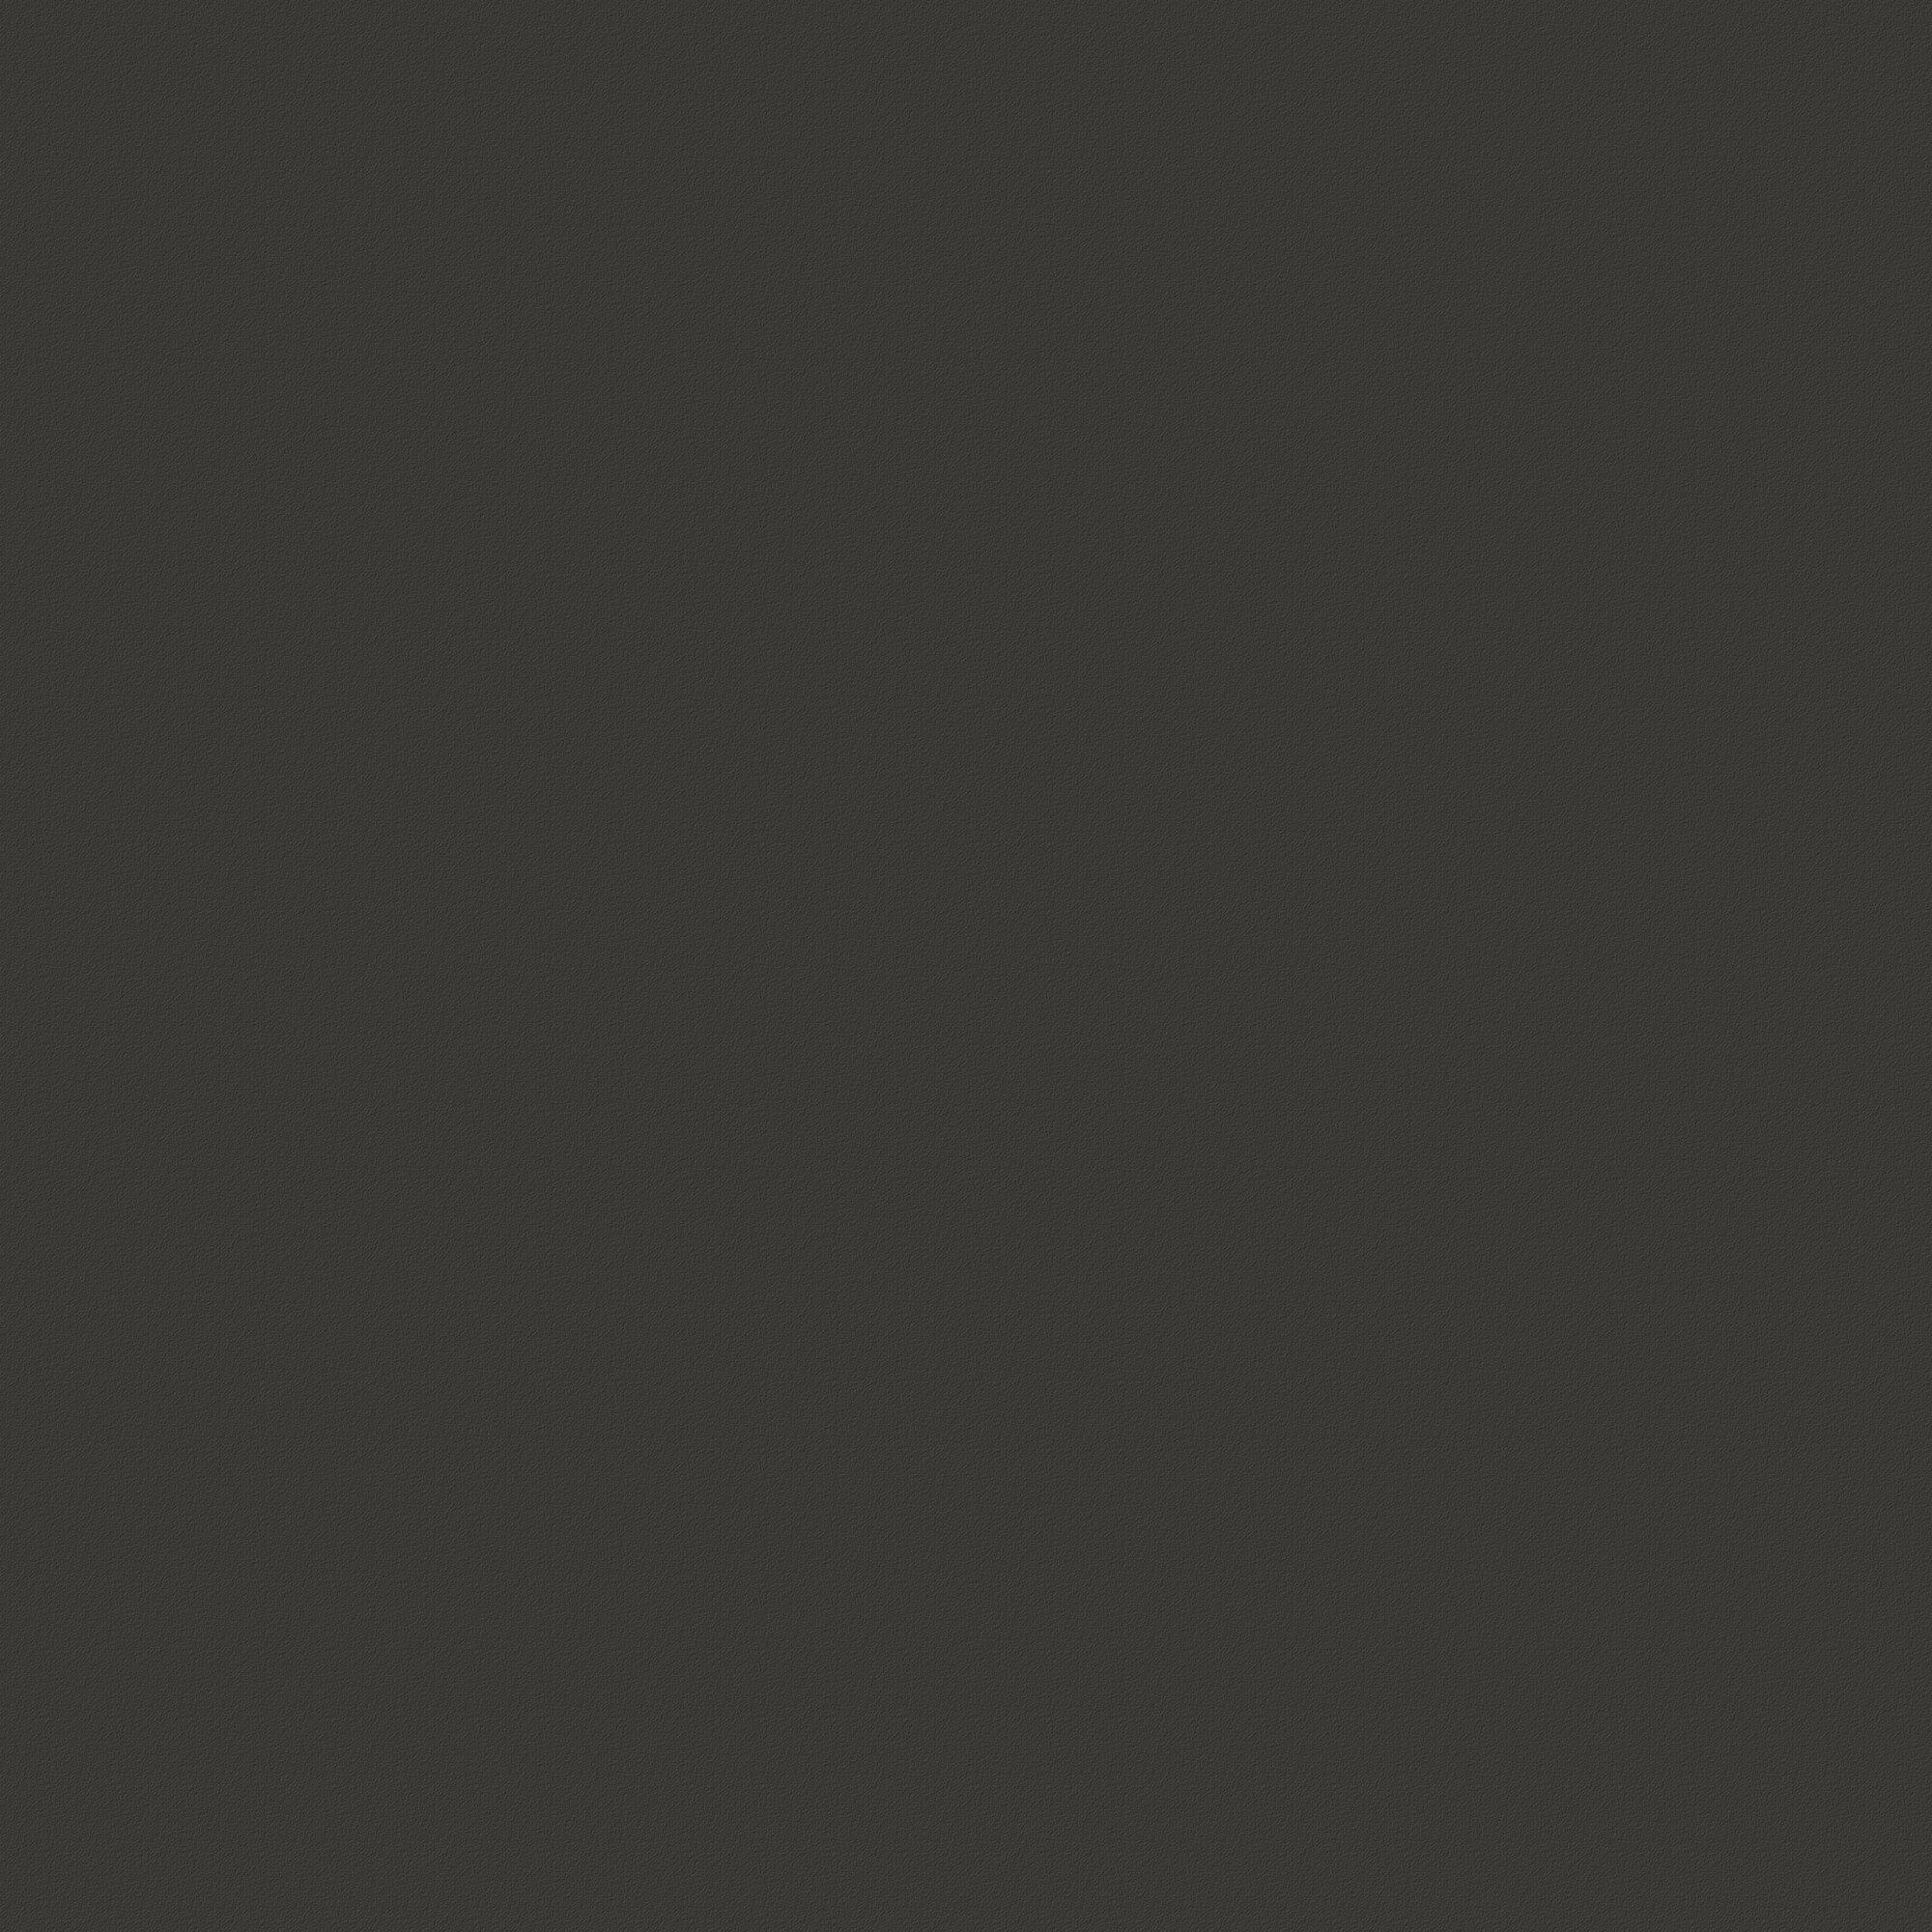 U166 VL Basalt Grey